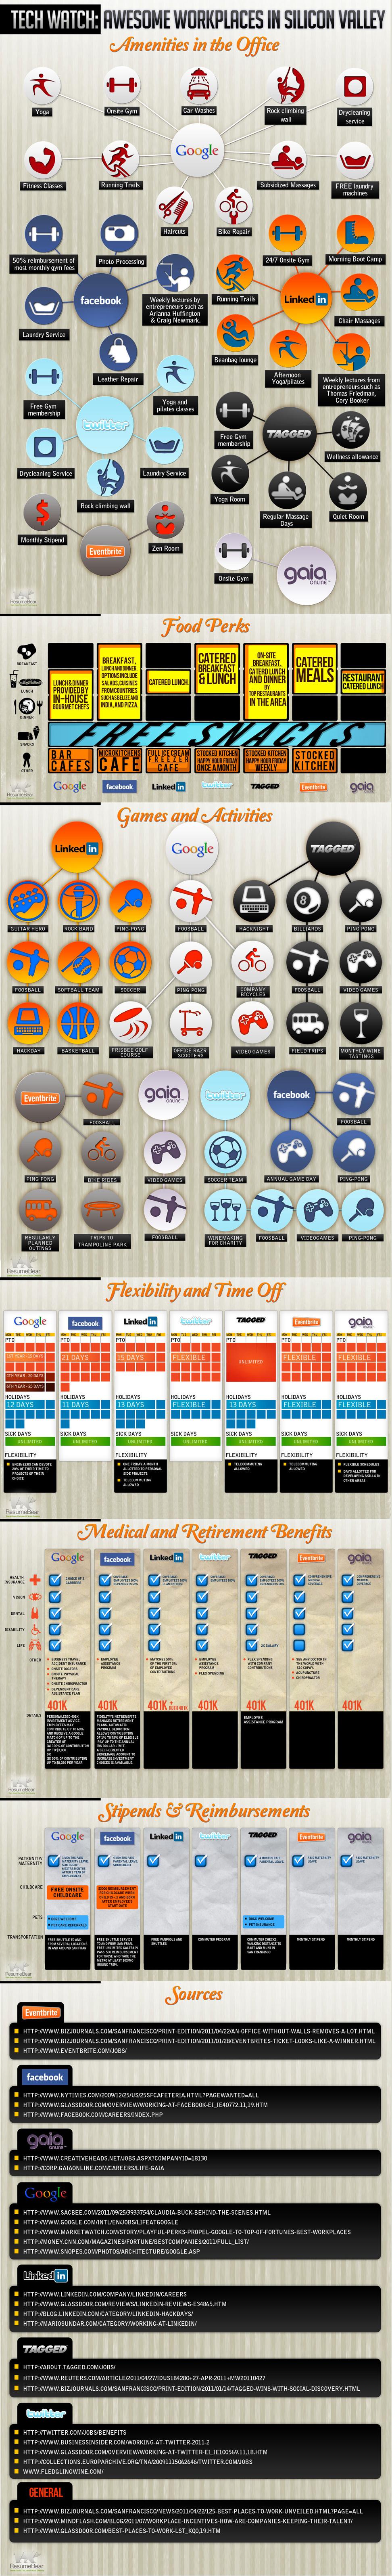 Visual - perks of working at google, facebook, twitter etc.